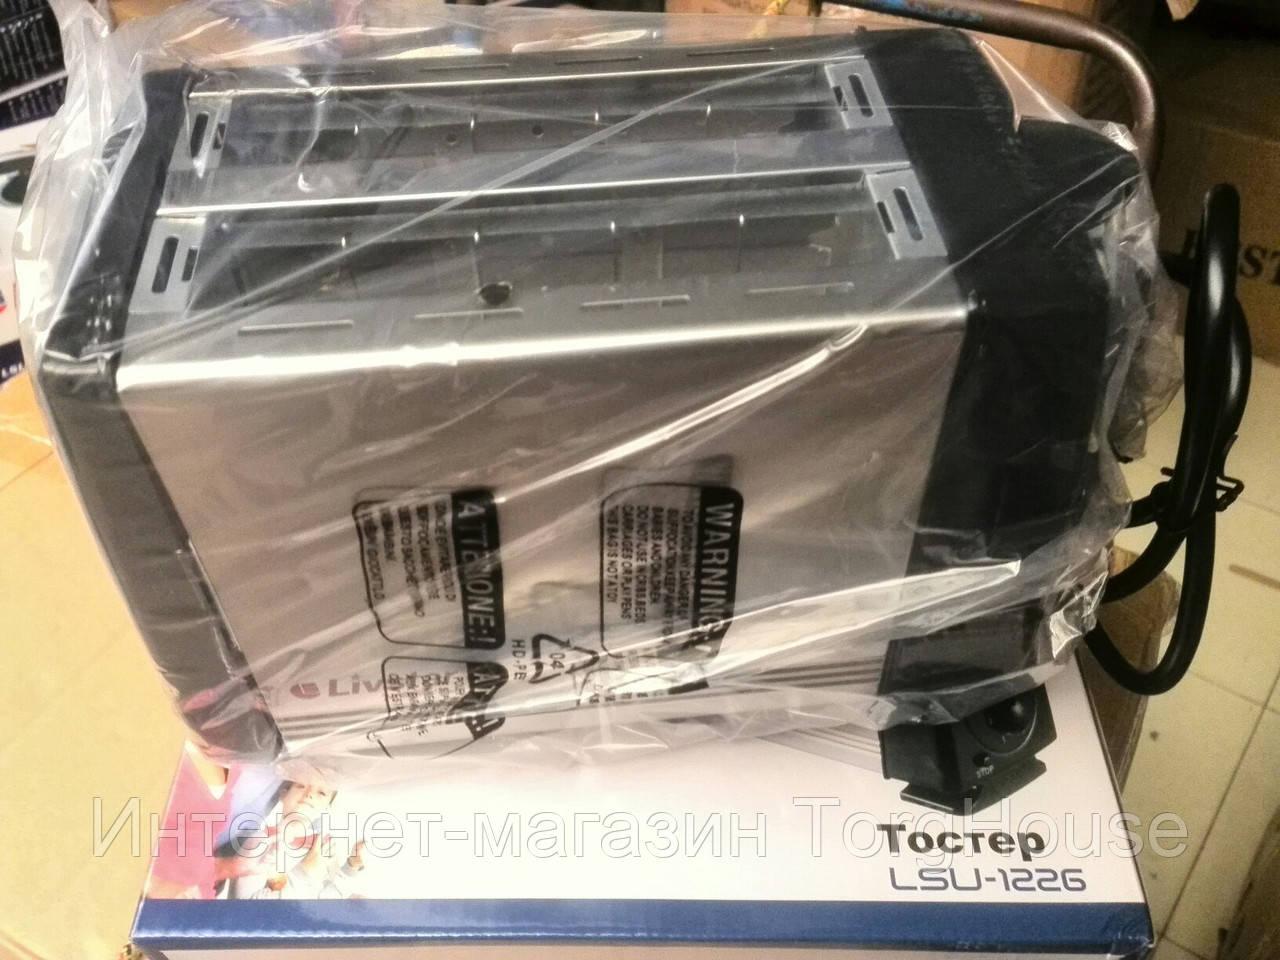 Тостер металлический LIVSTAR LSU-1226